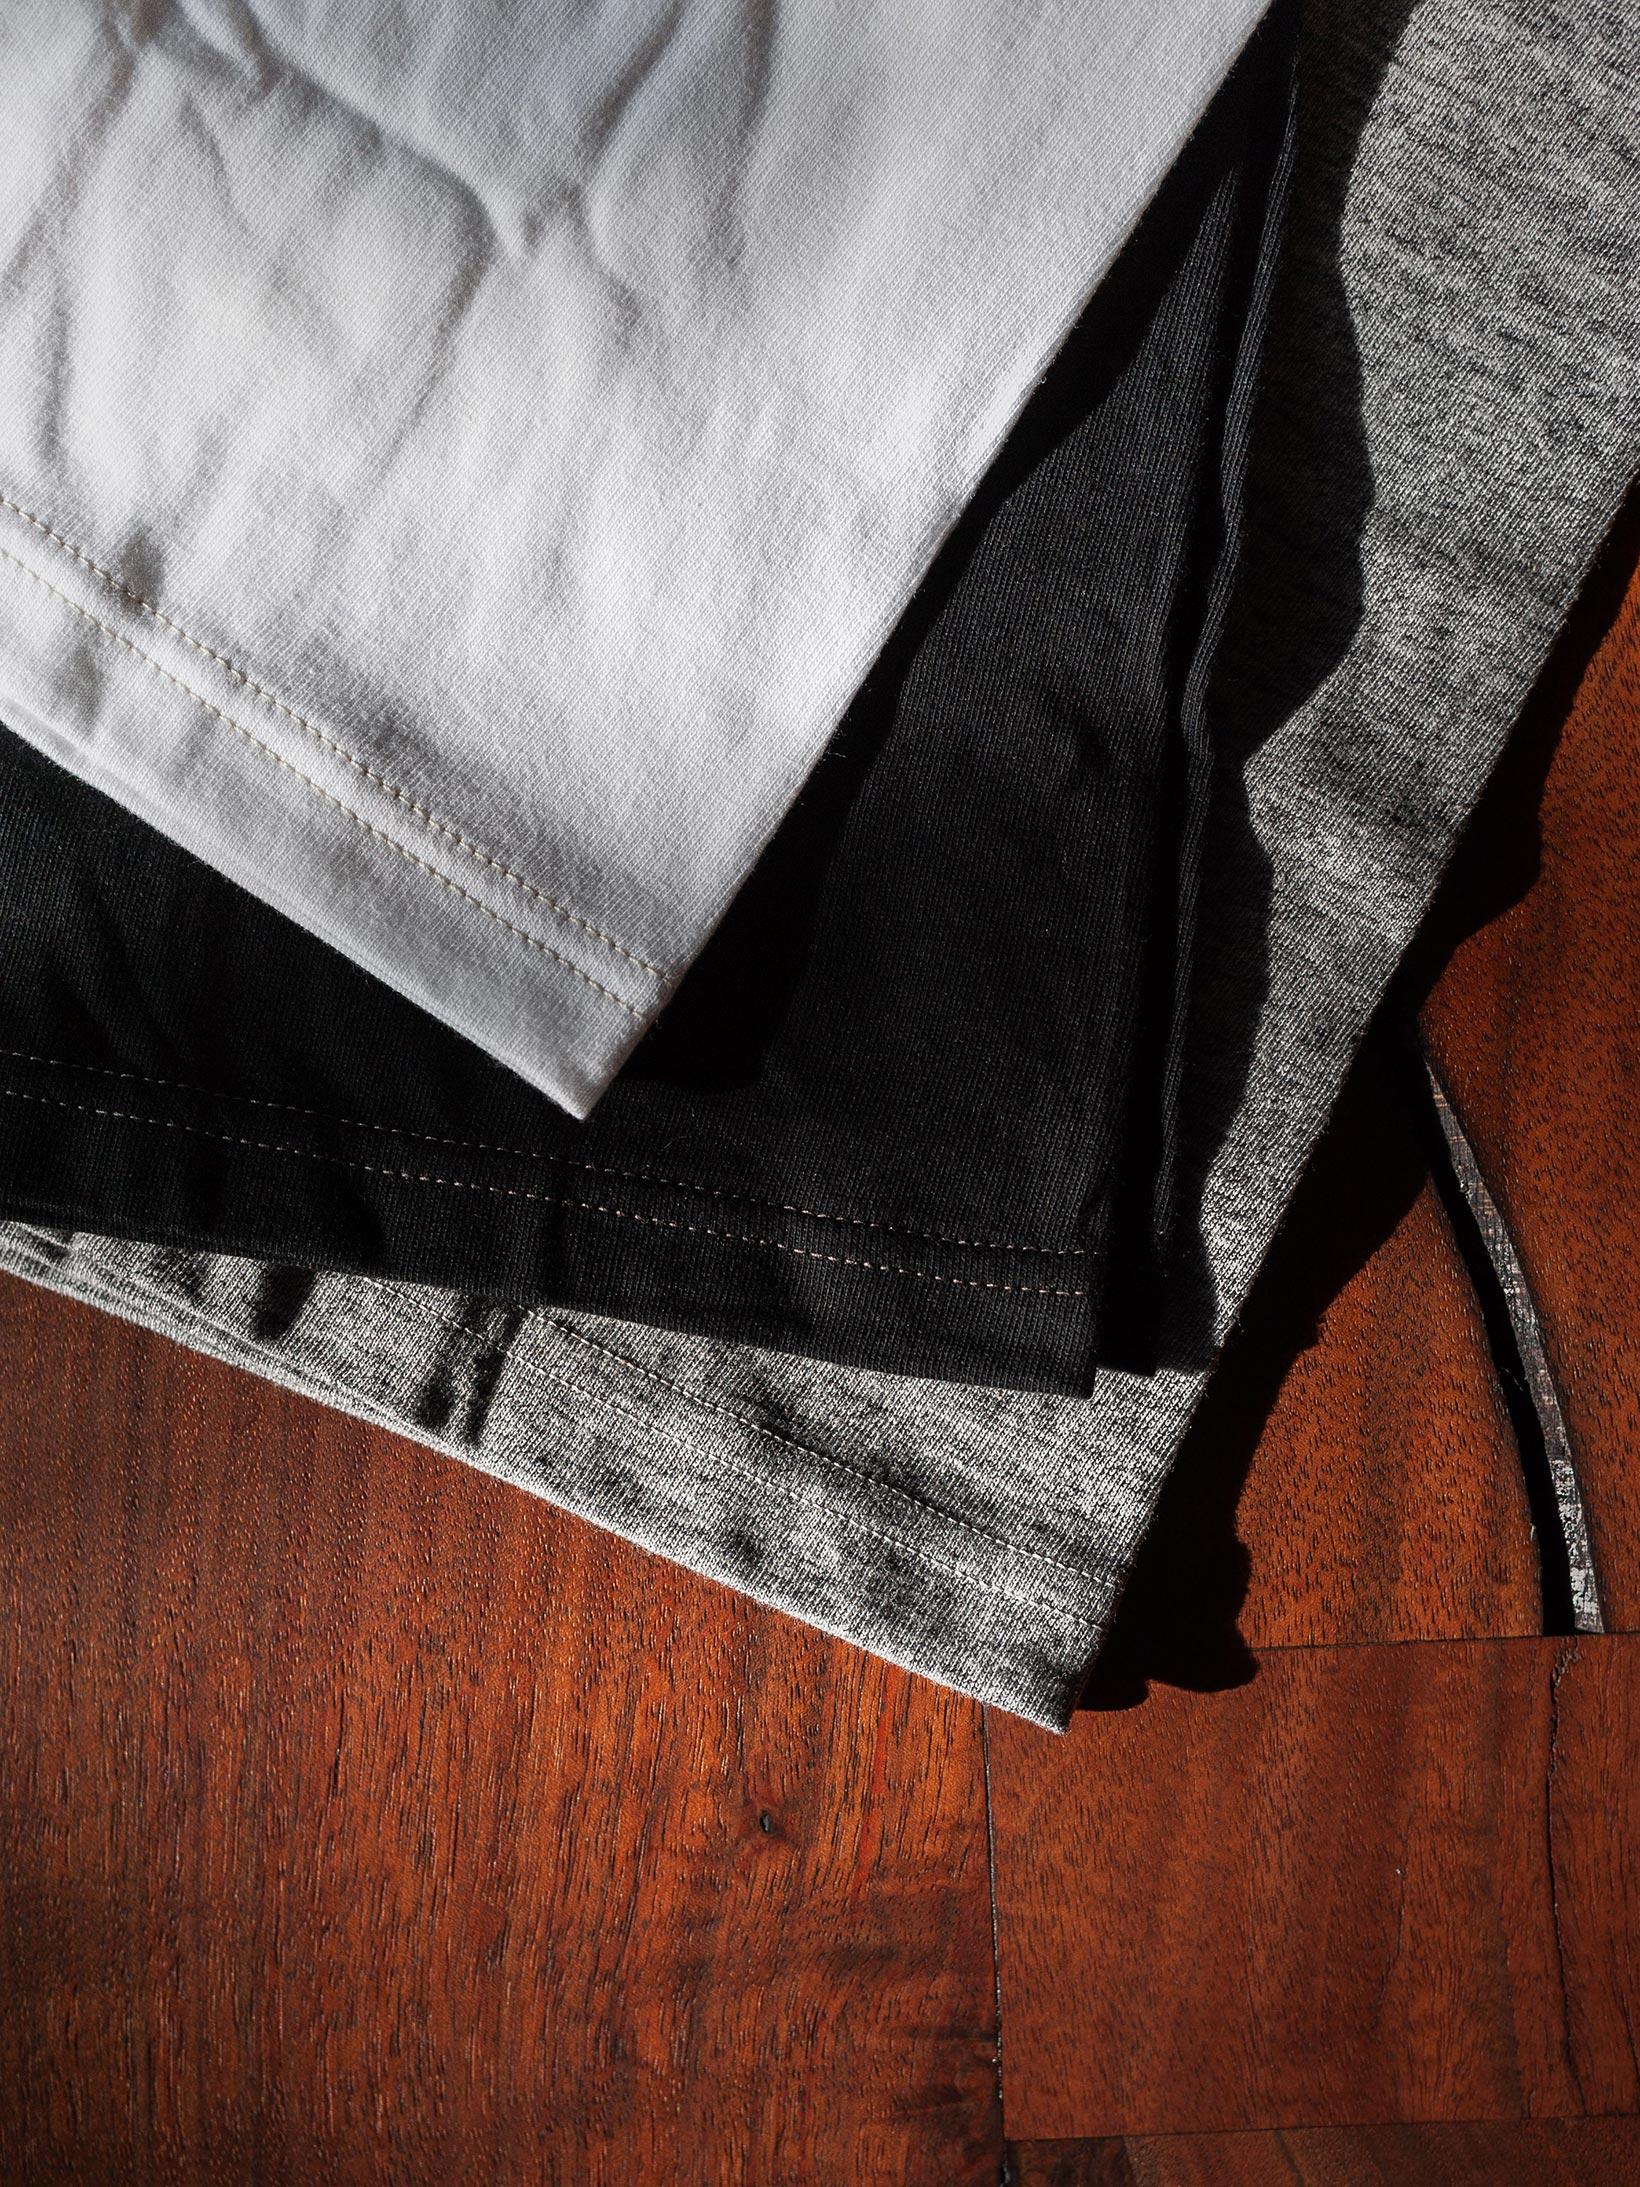 Whitesville Japanese Made T-Shirts - White (2-Pack) - Image 11